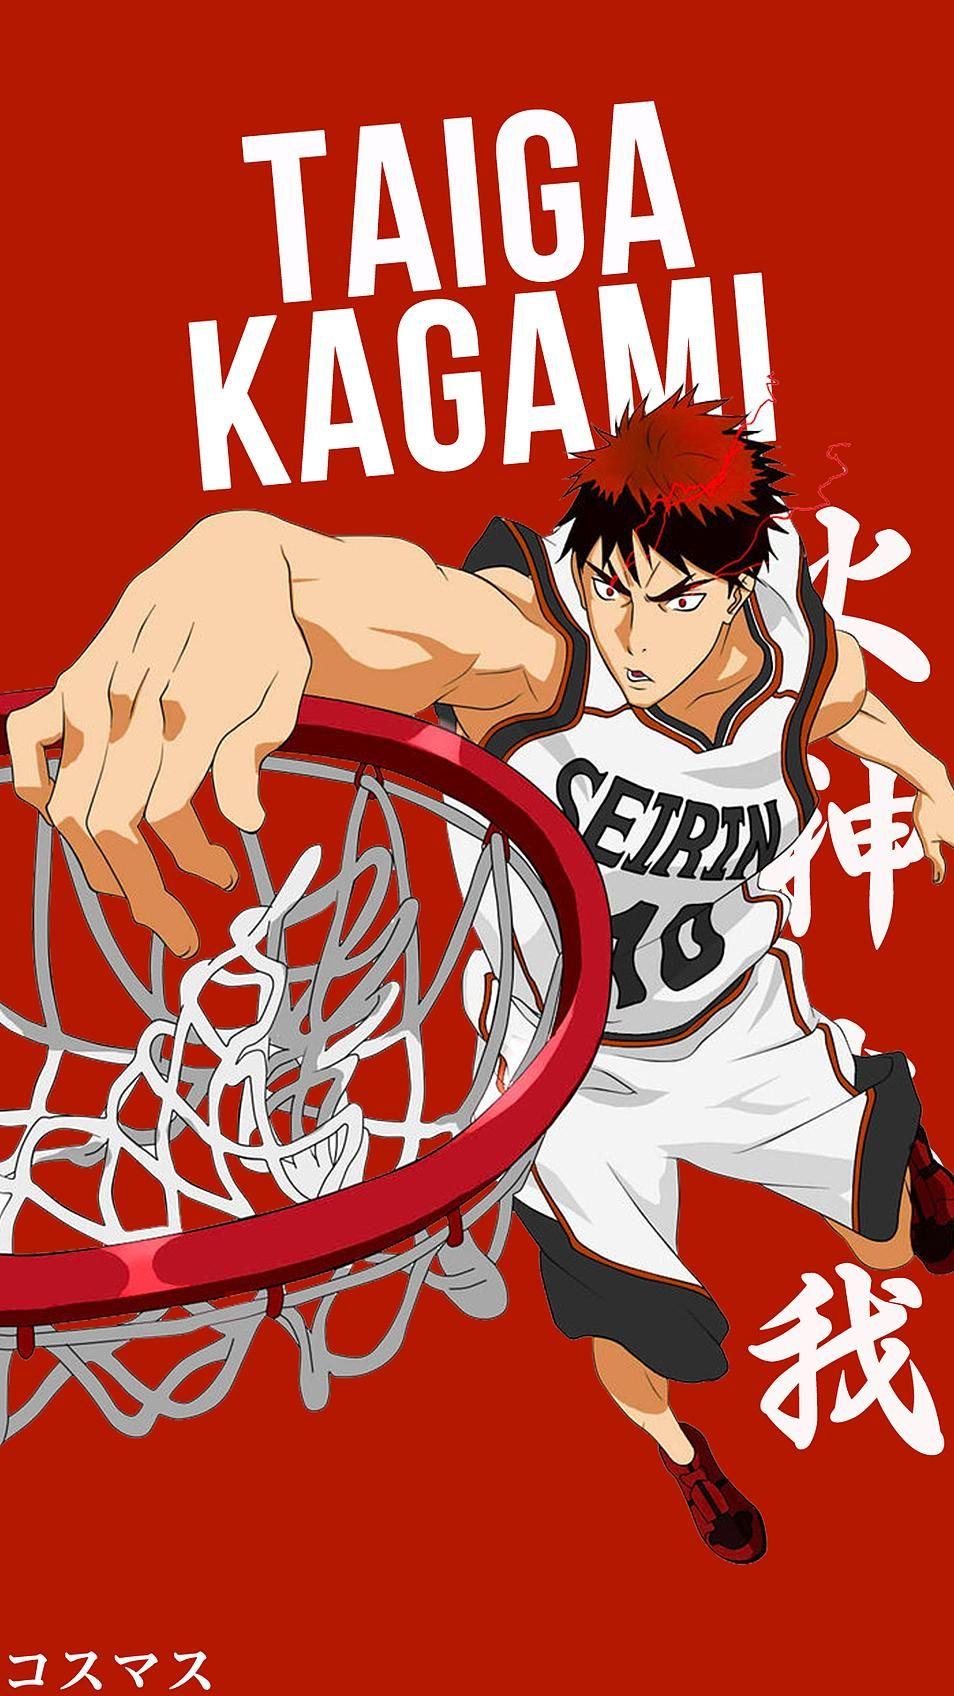 Kagami Taiga Personajes De Anime Kuroko Y Fondo De Anime